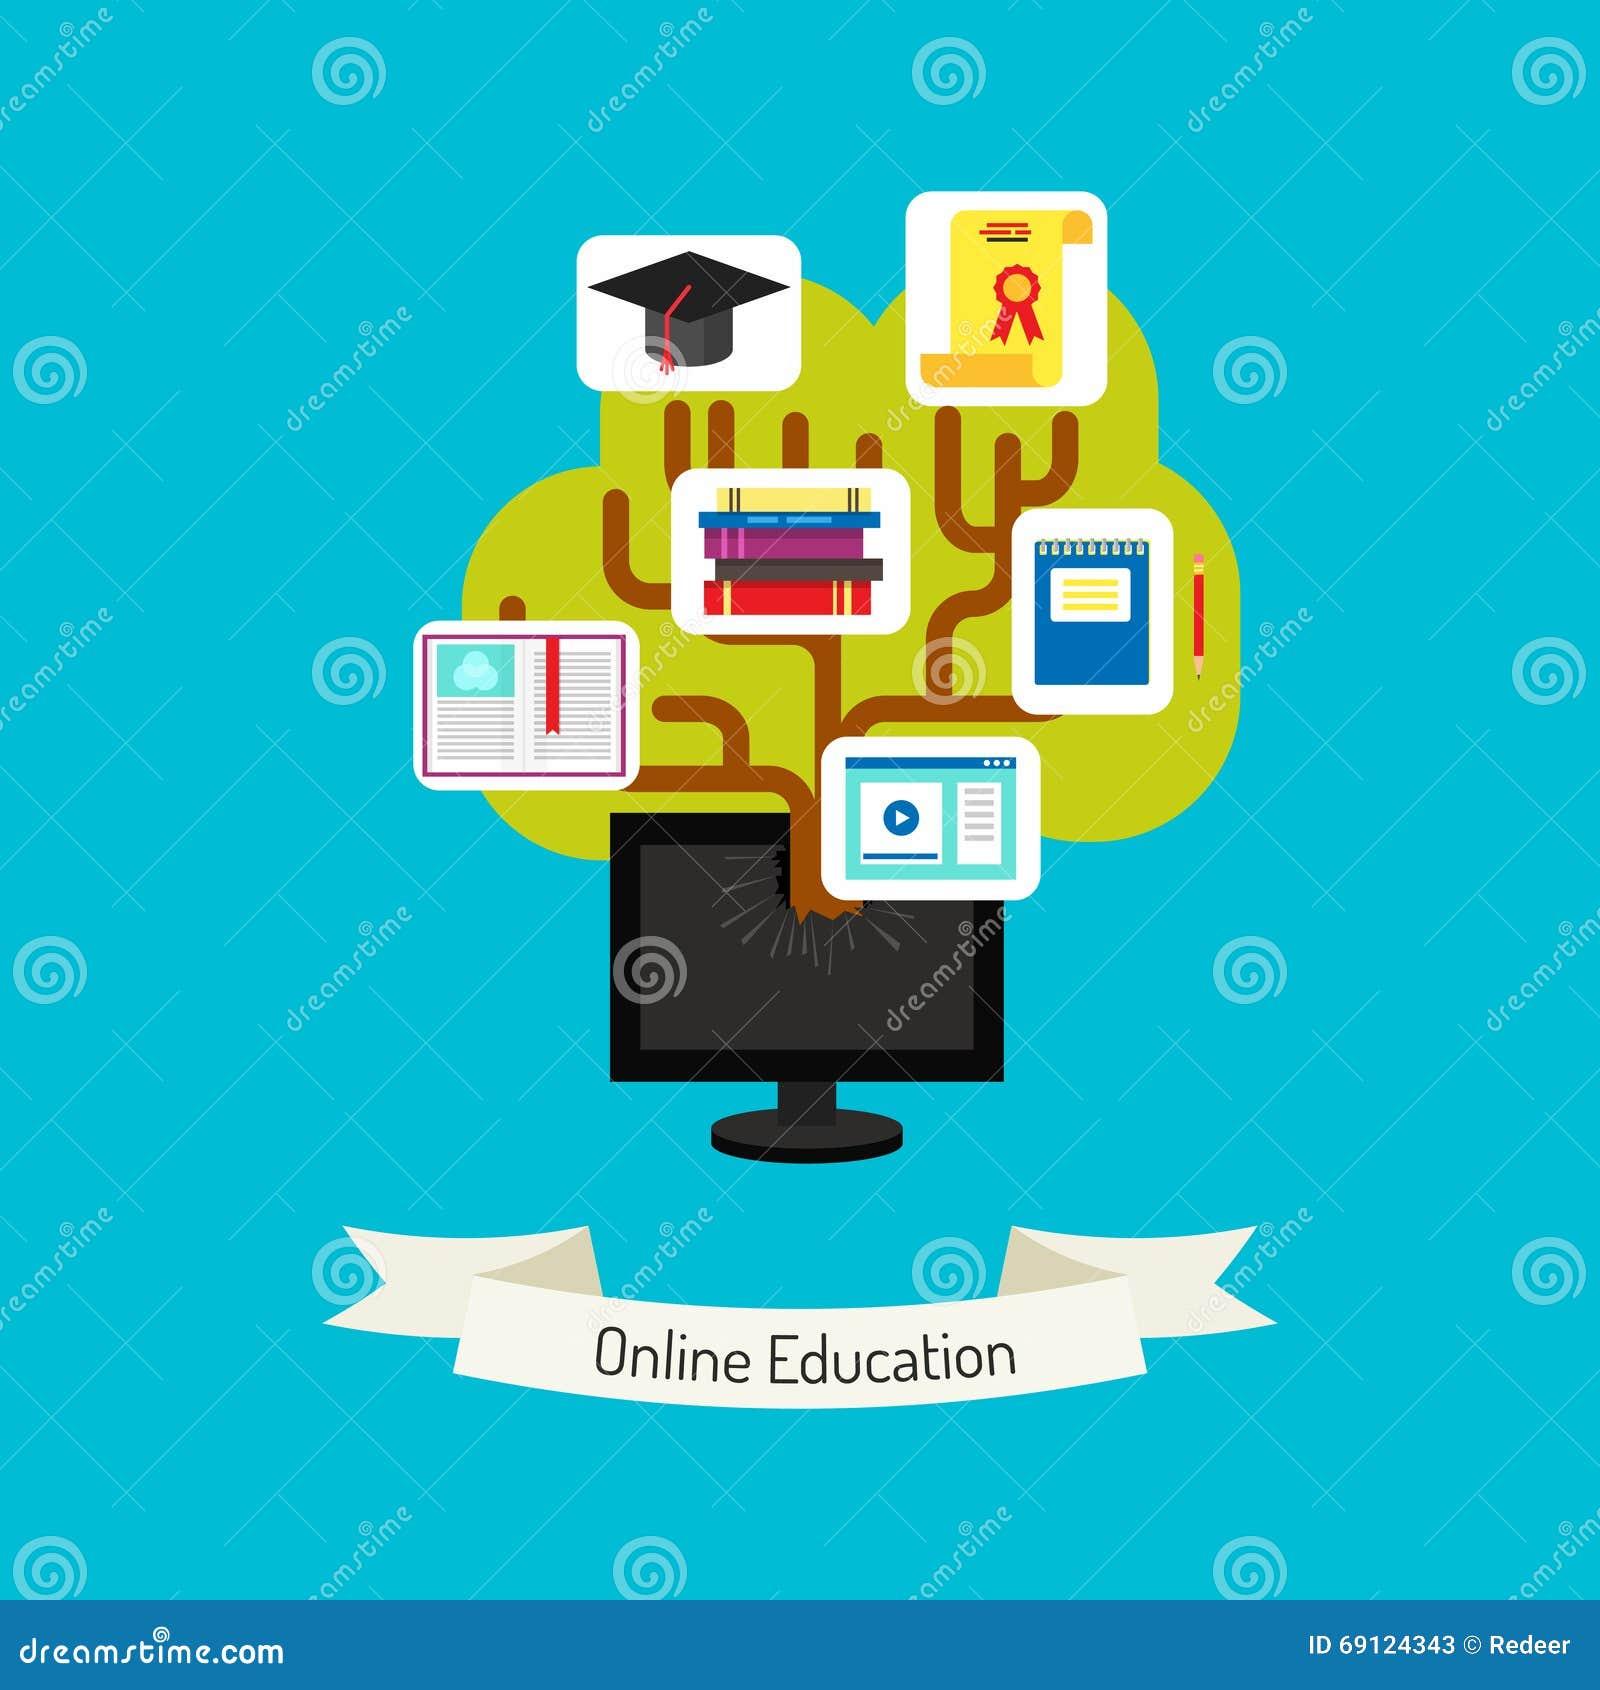 Online Education Concept Illustration. Stock Illustration ...